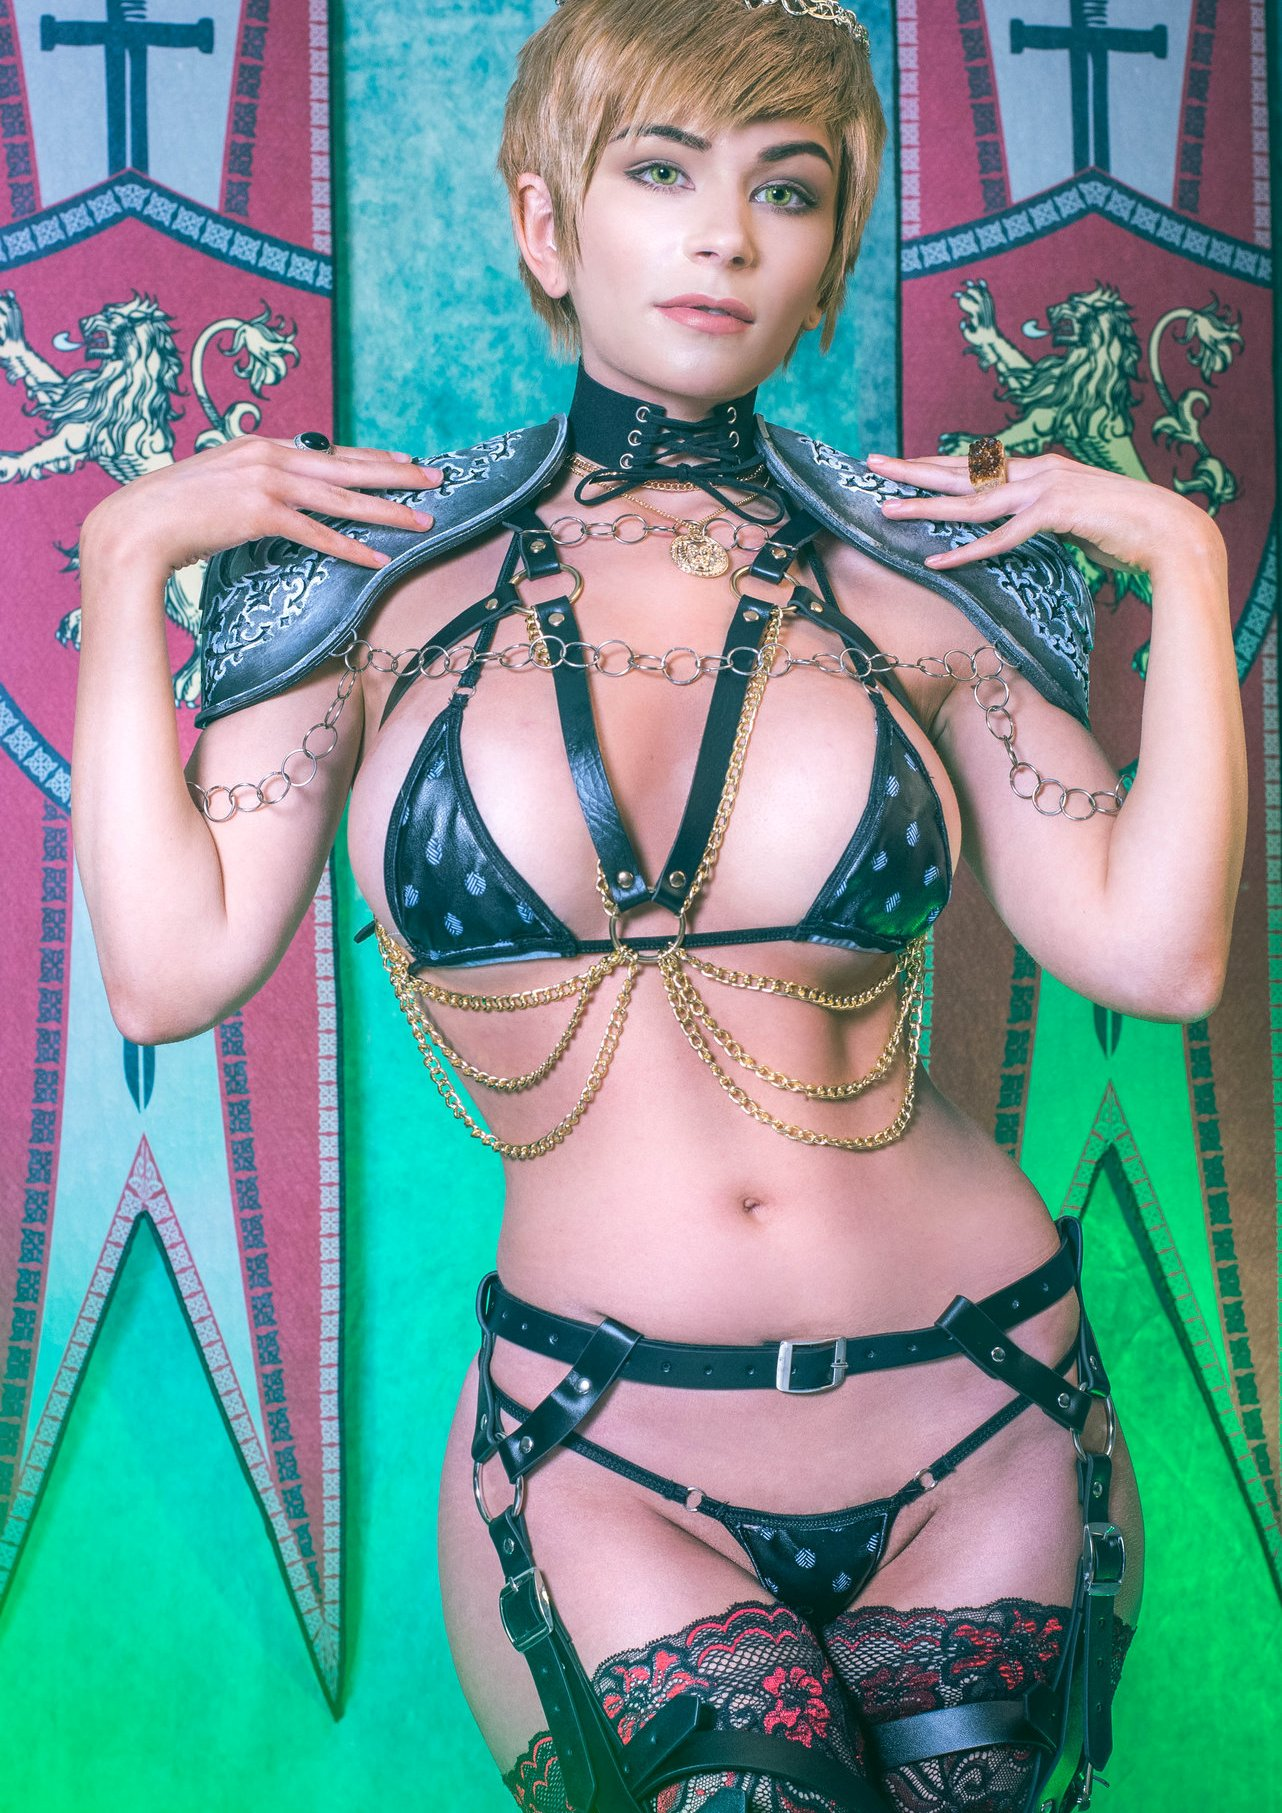 Danielle Beaulieu Daniellecosplay Onlyfans Nude Leaks 0029